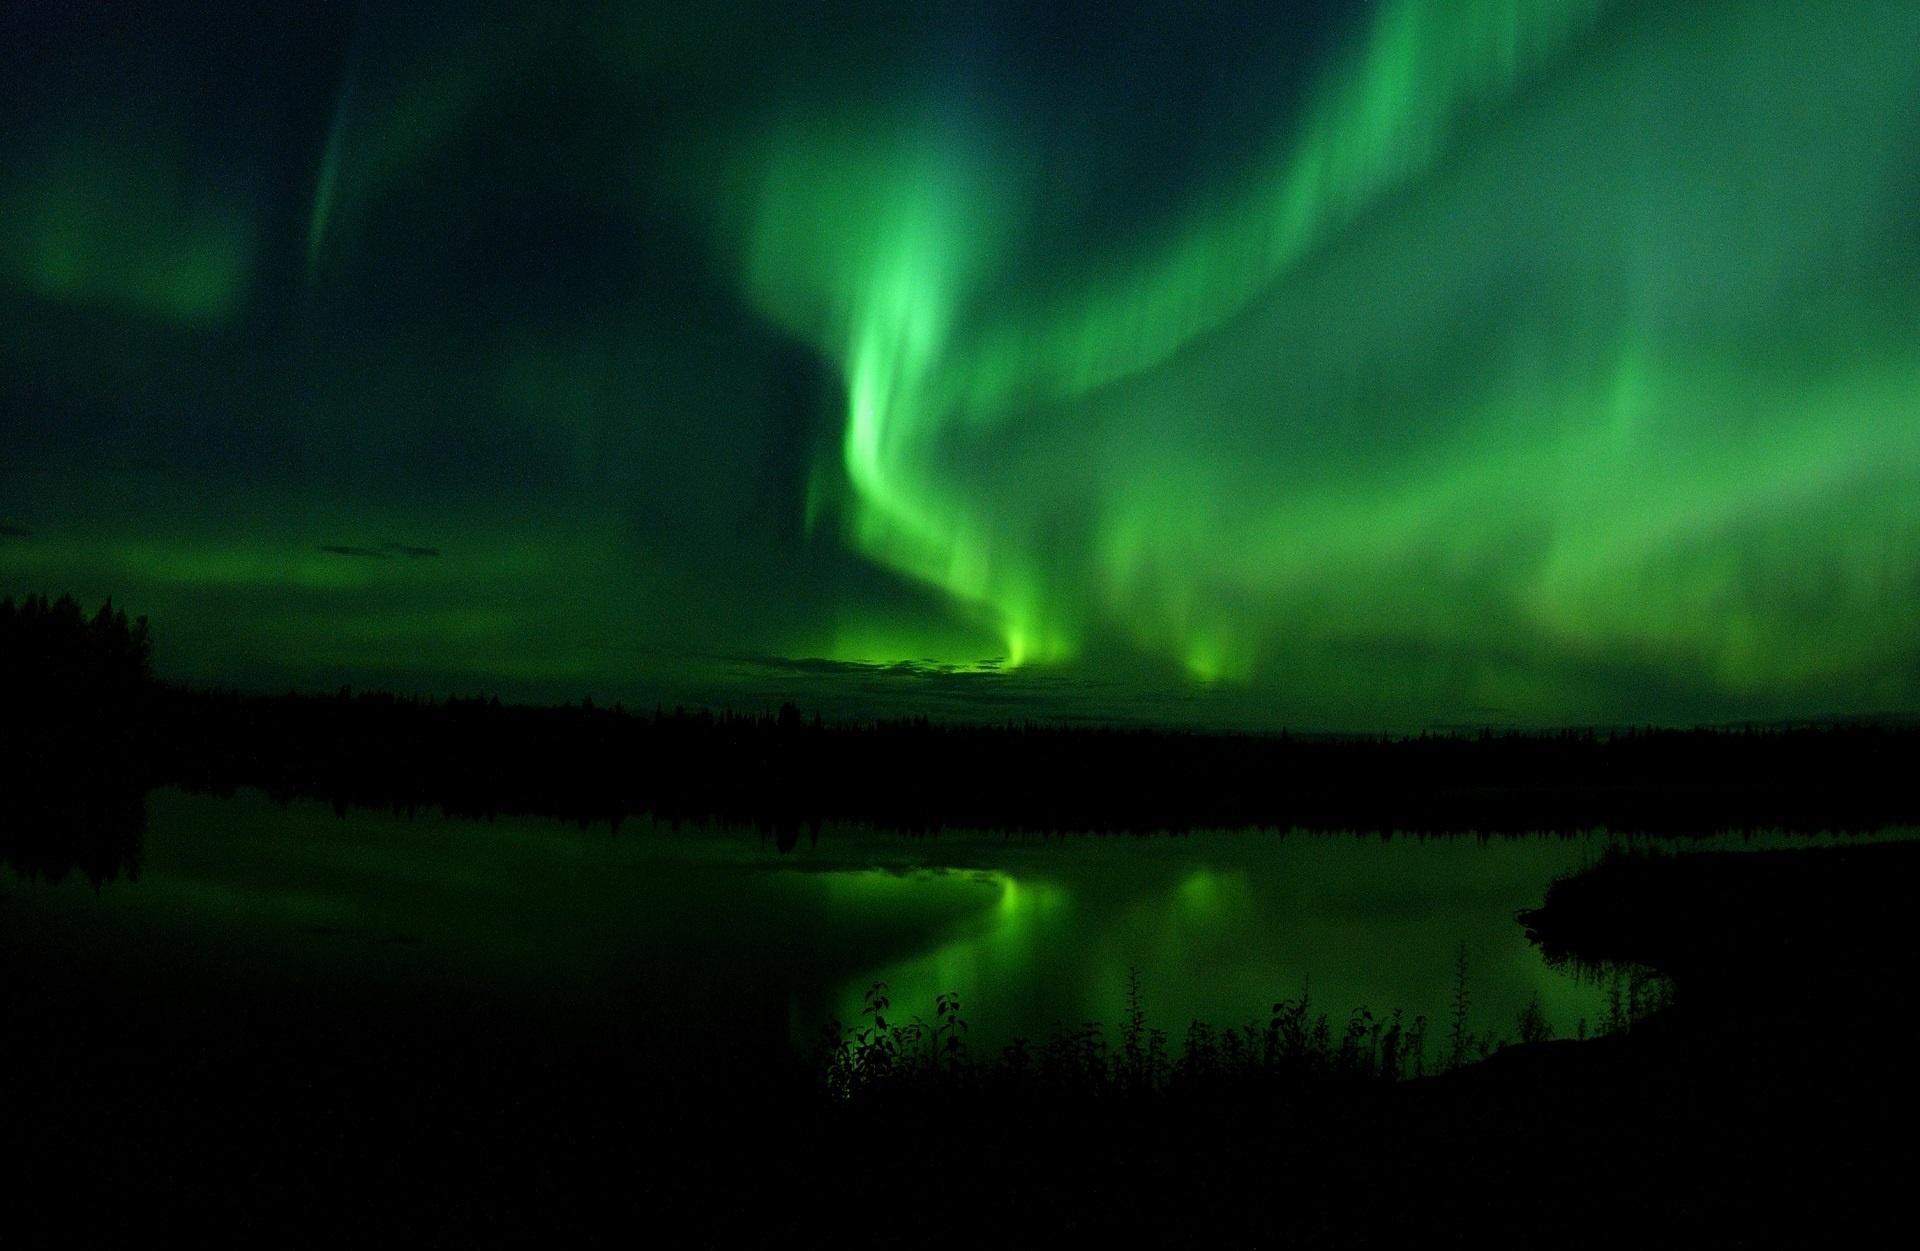 Aurora Borealis; the Northern Lights.